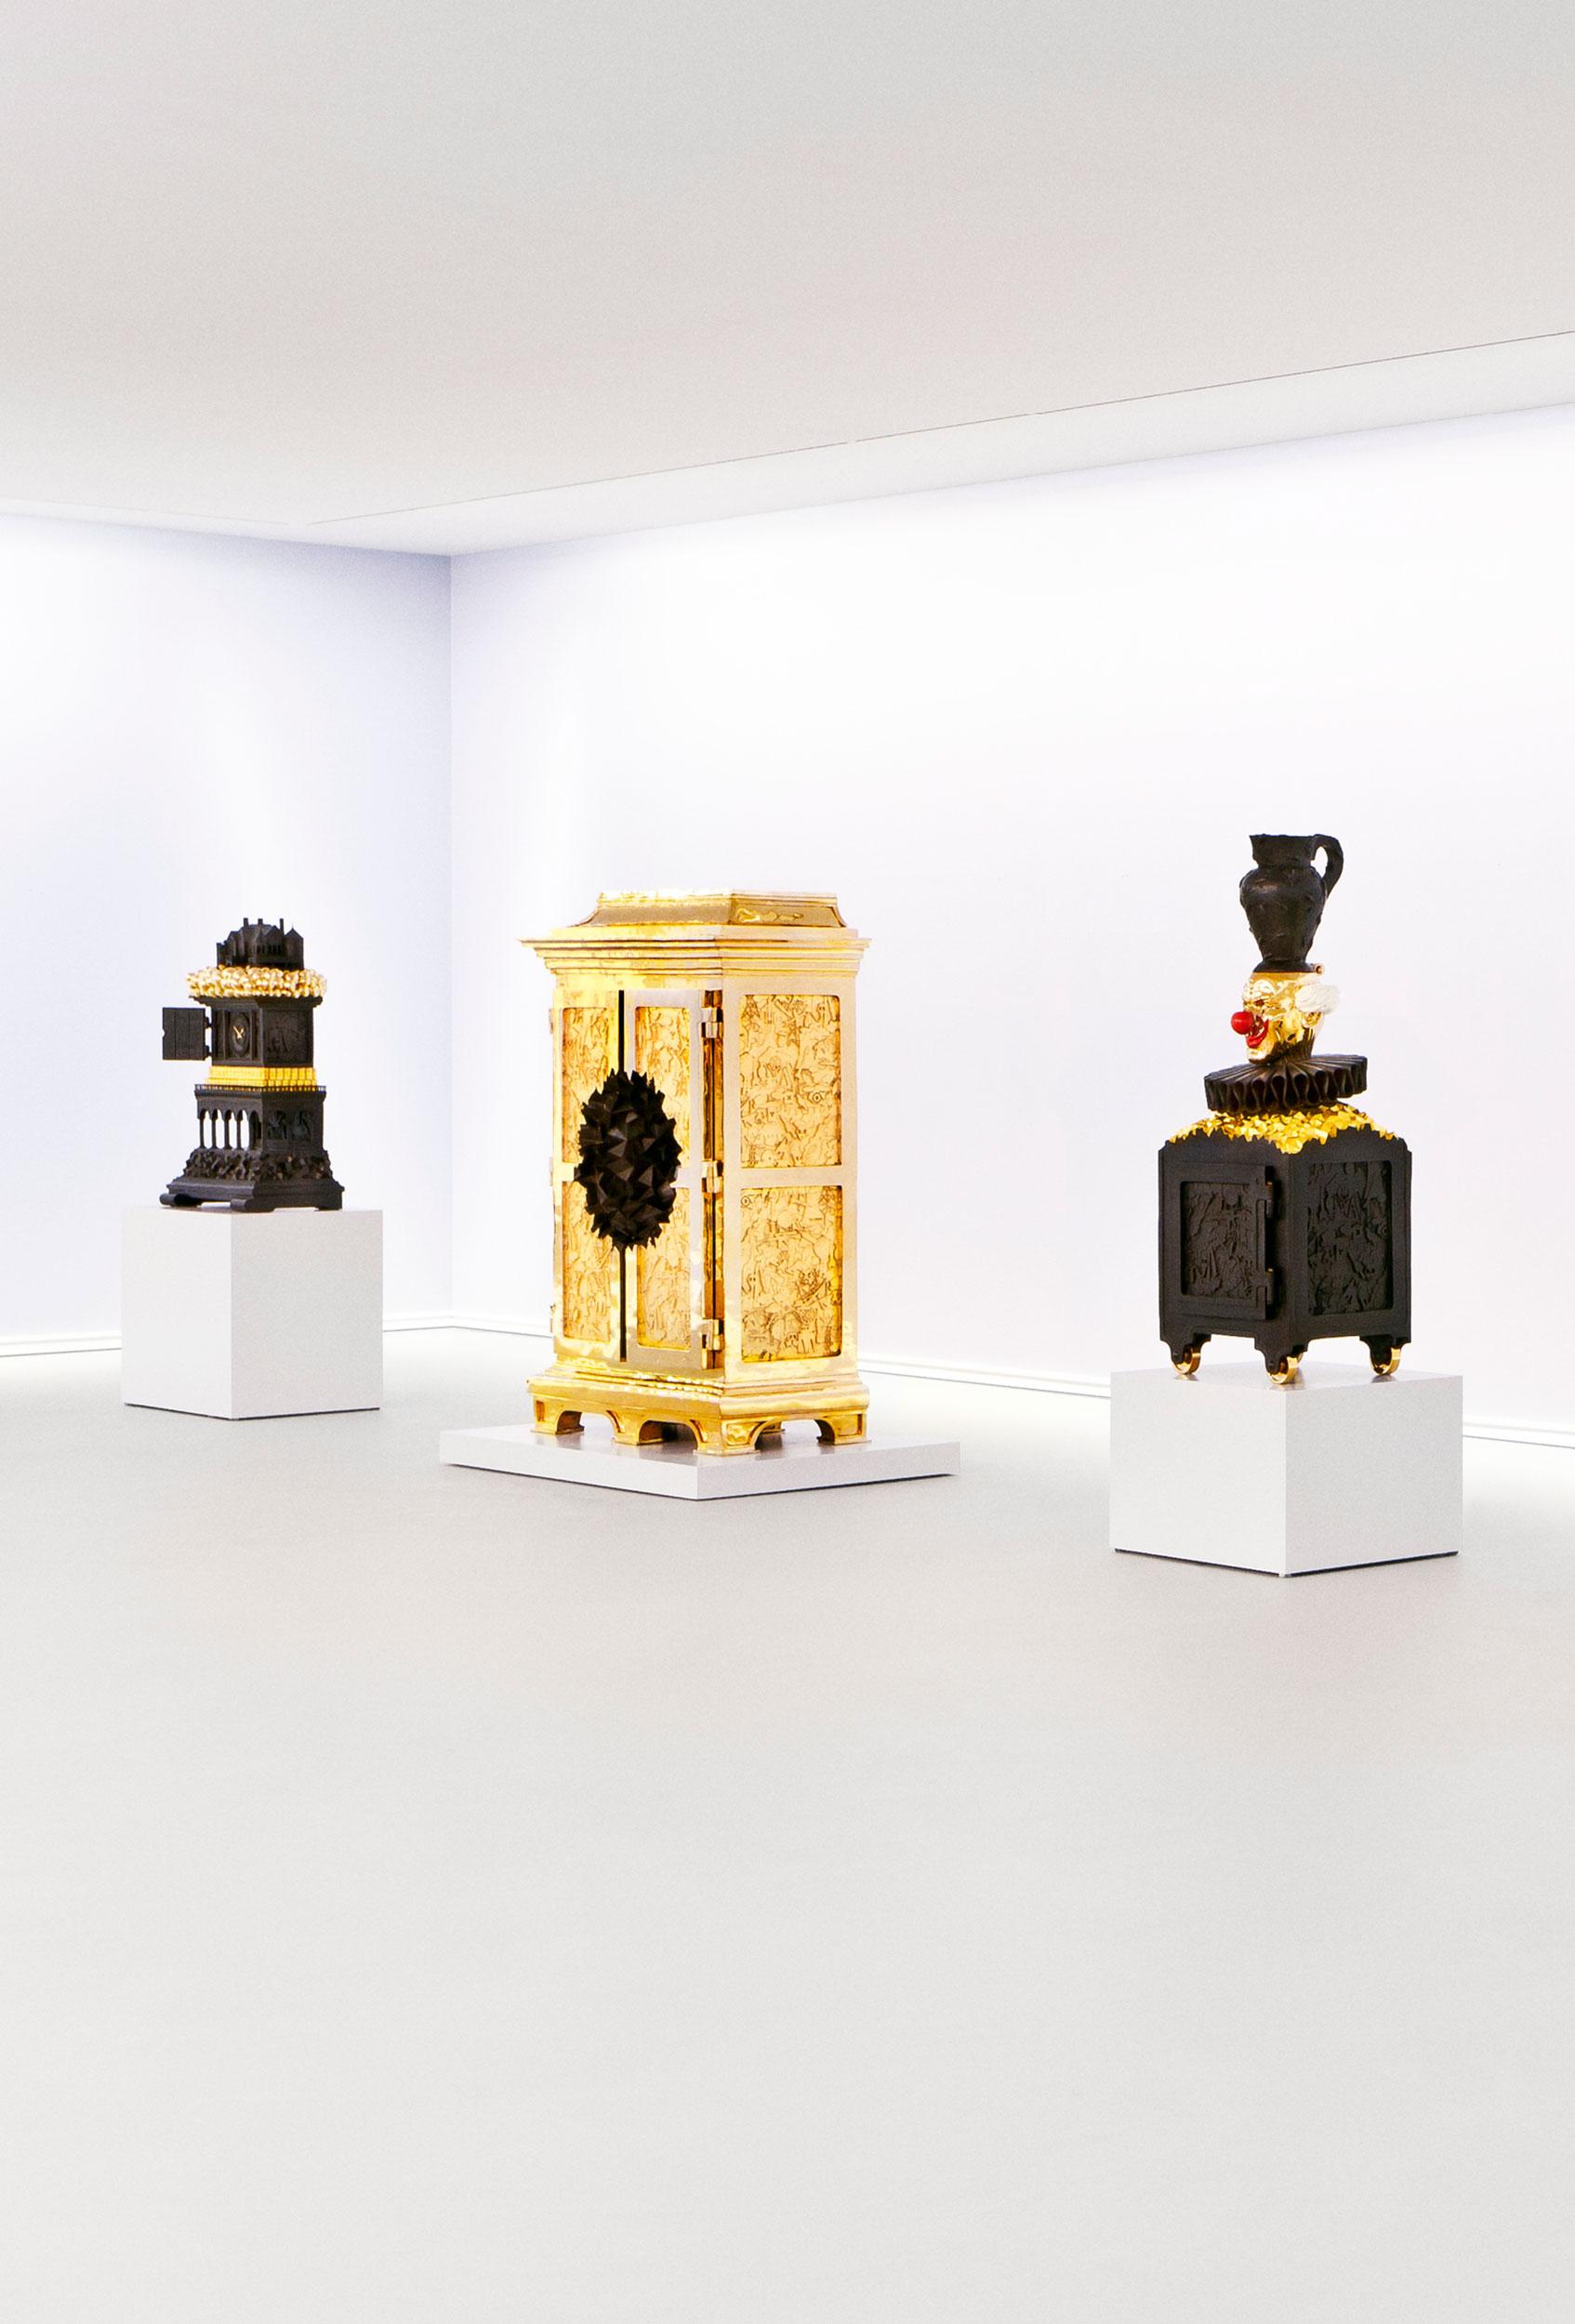 Robber-Baron-Groninger-Museum-Studio-Job